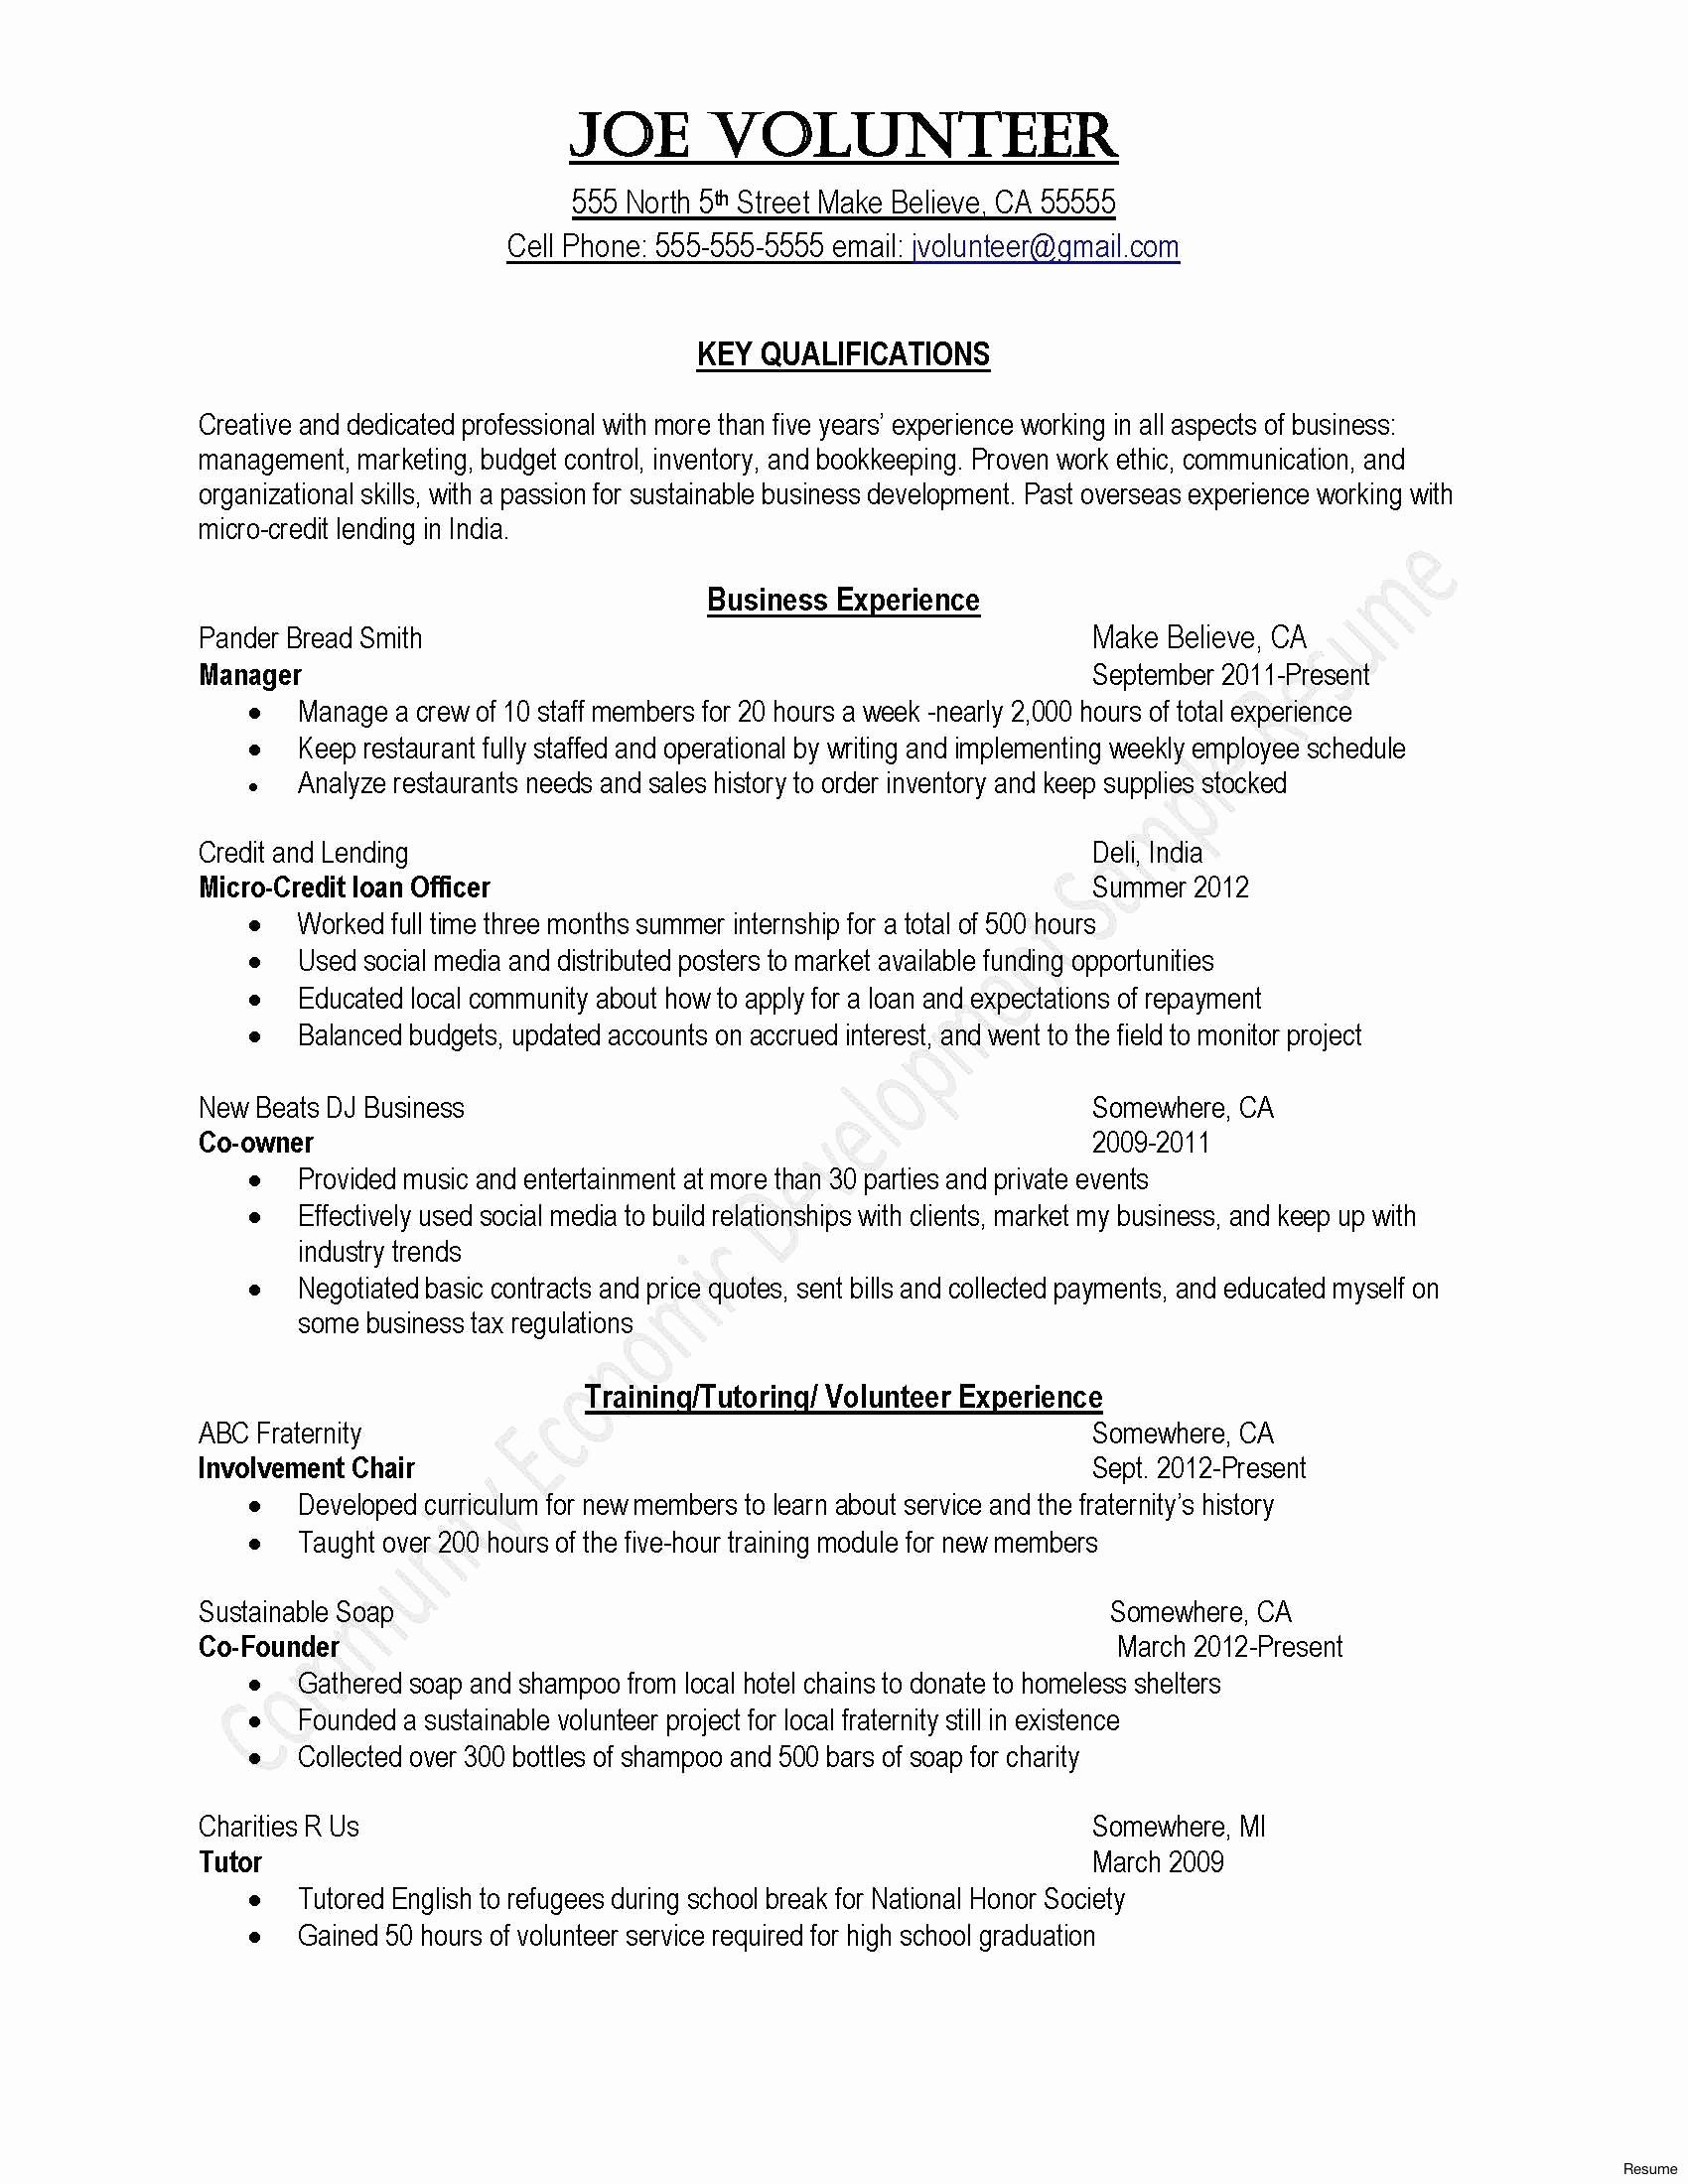 Best essay writing service reddit